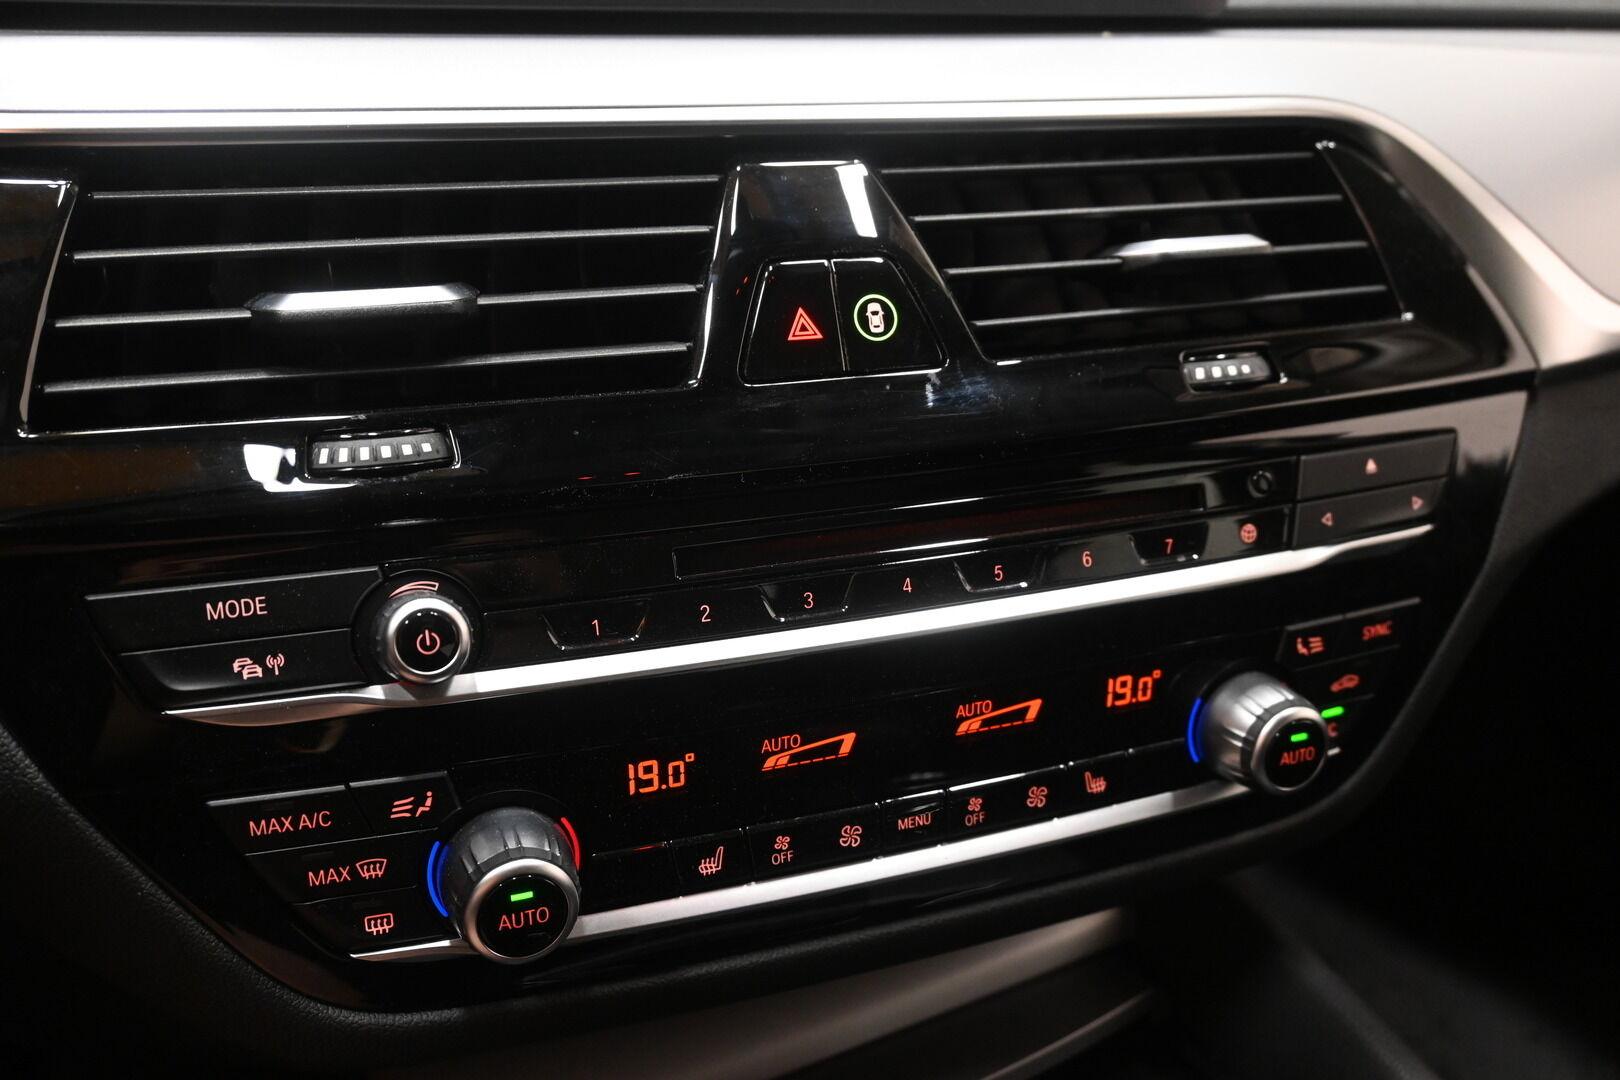 Musta Sedan, BMW 530 – KON-32251, kuva 16